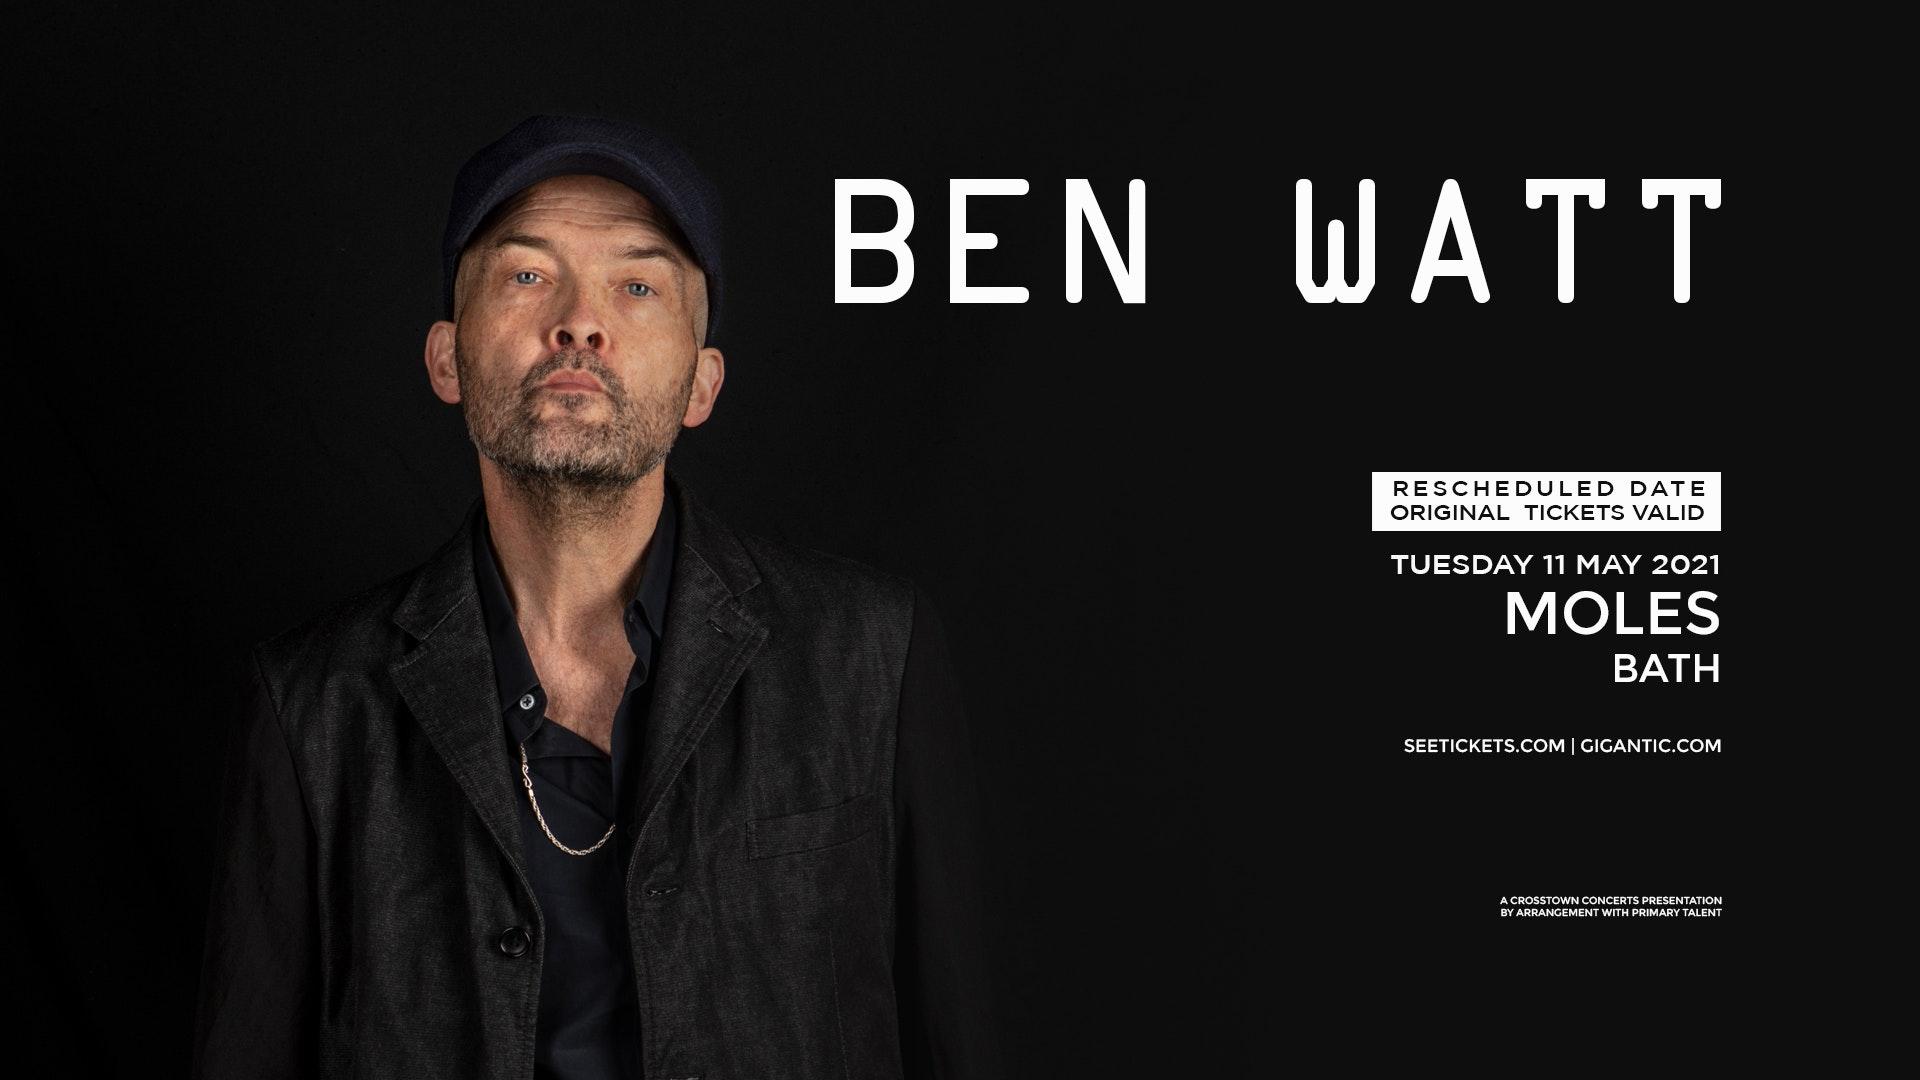 Ben Watt at Moles – Rescheduled date to Tuesday May 11th 2021